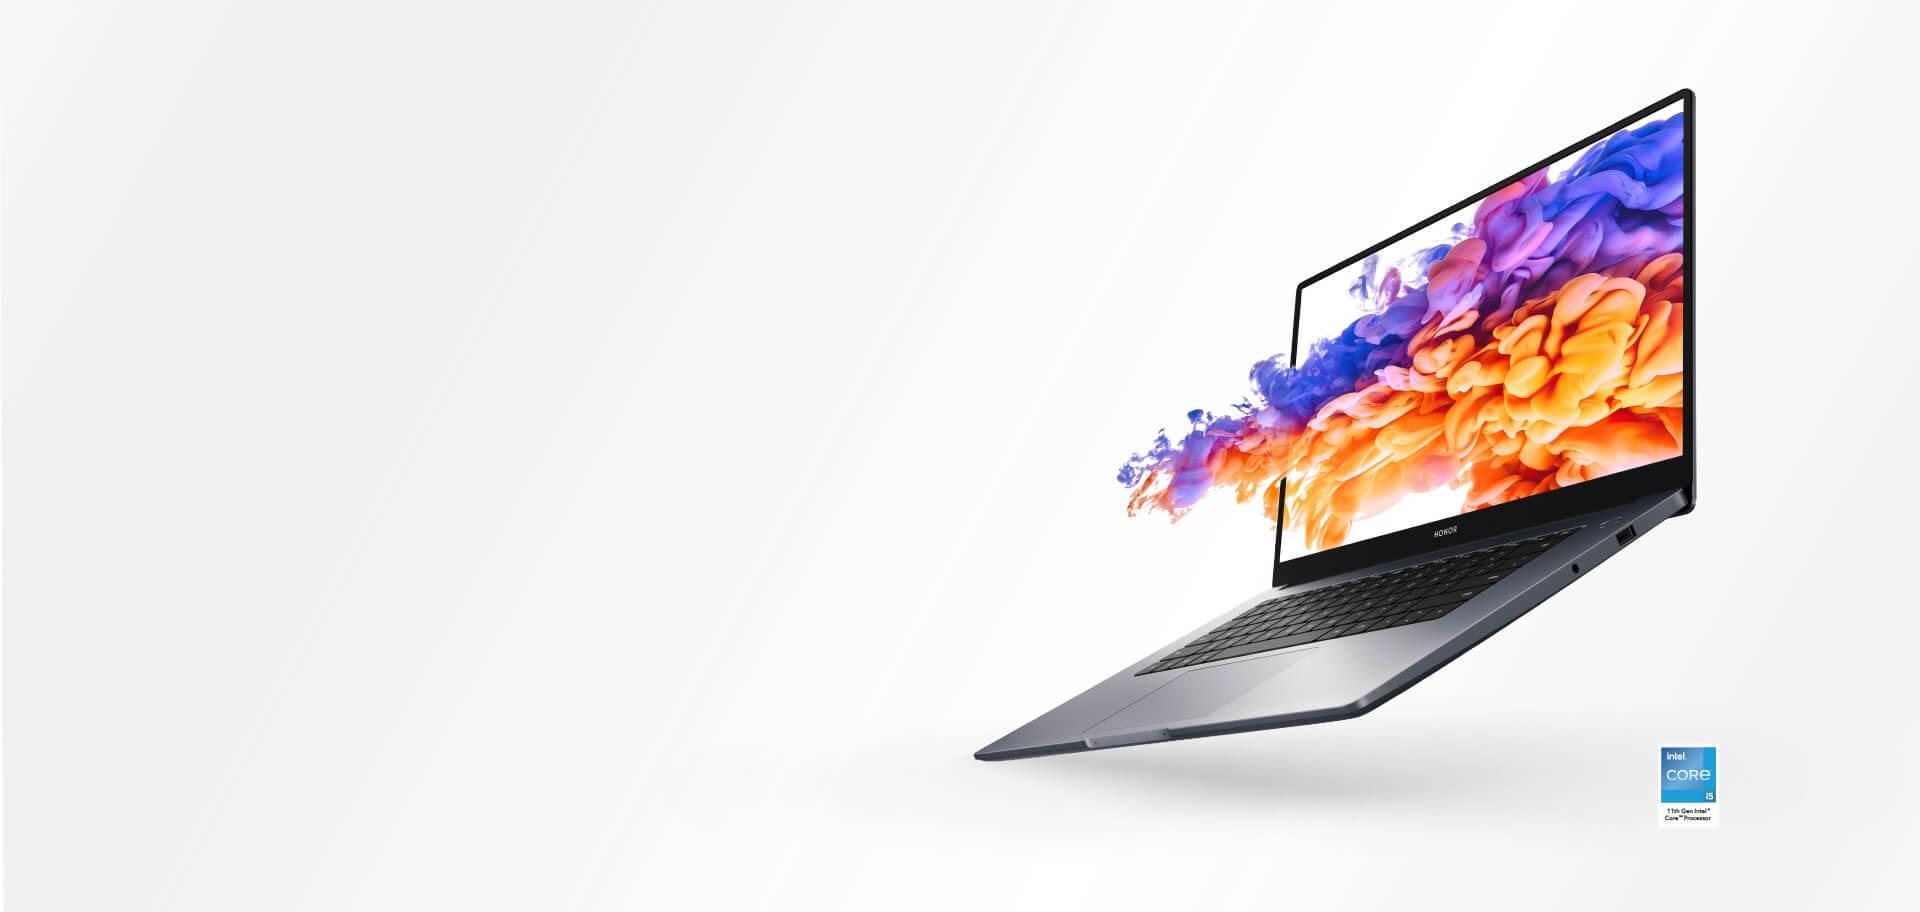 Buy HONOR MagicBook 15 2021 | HONOR Official Site (Global)